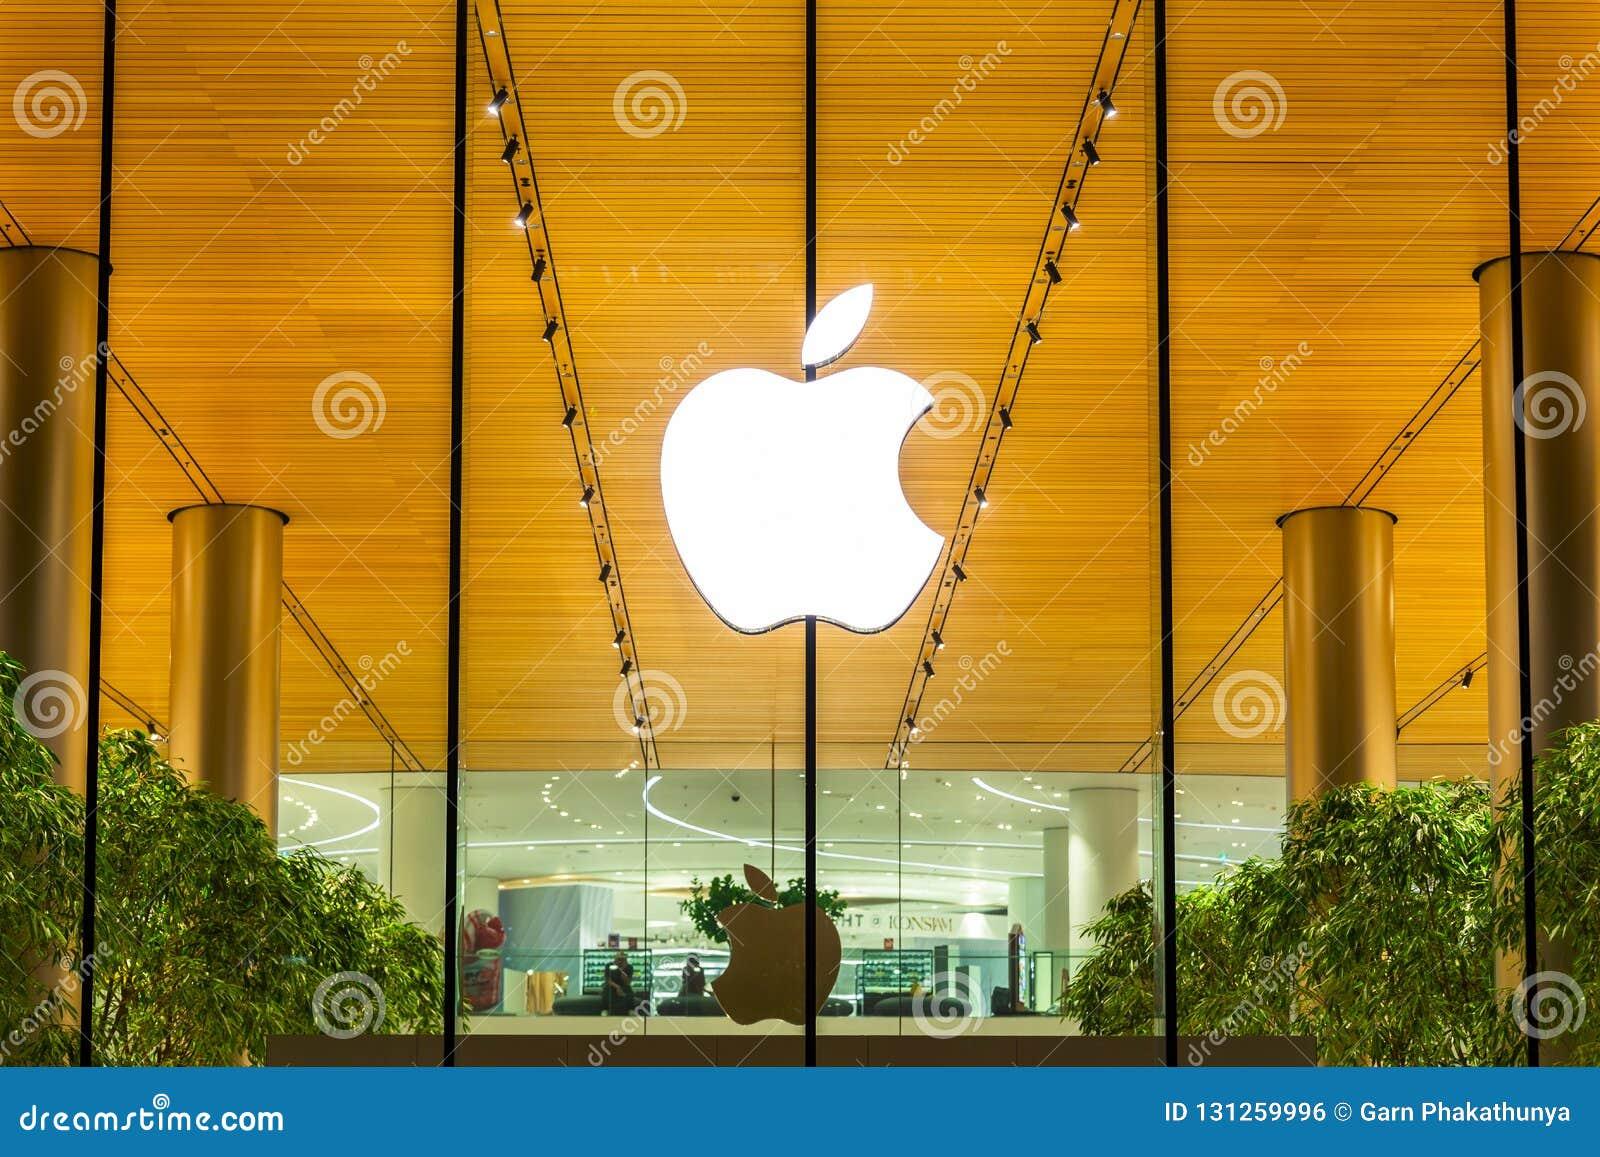 Bangkok, Thailand - November 9, 2018 : Apple store shopfront log